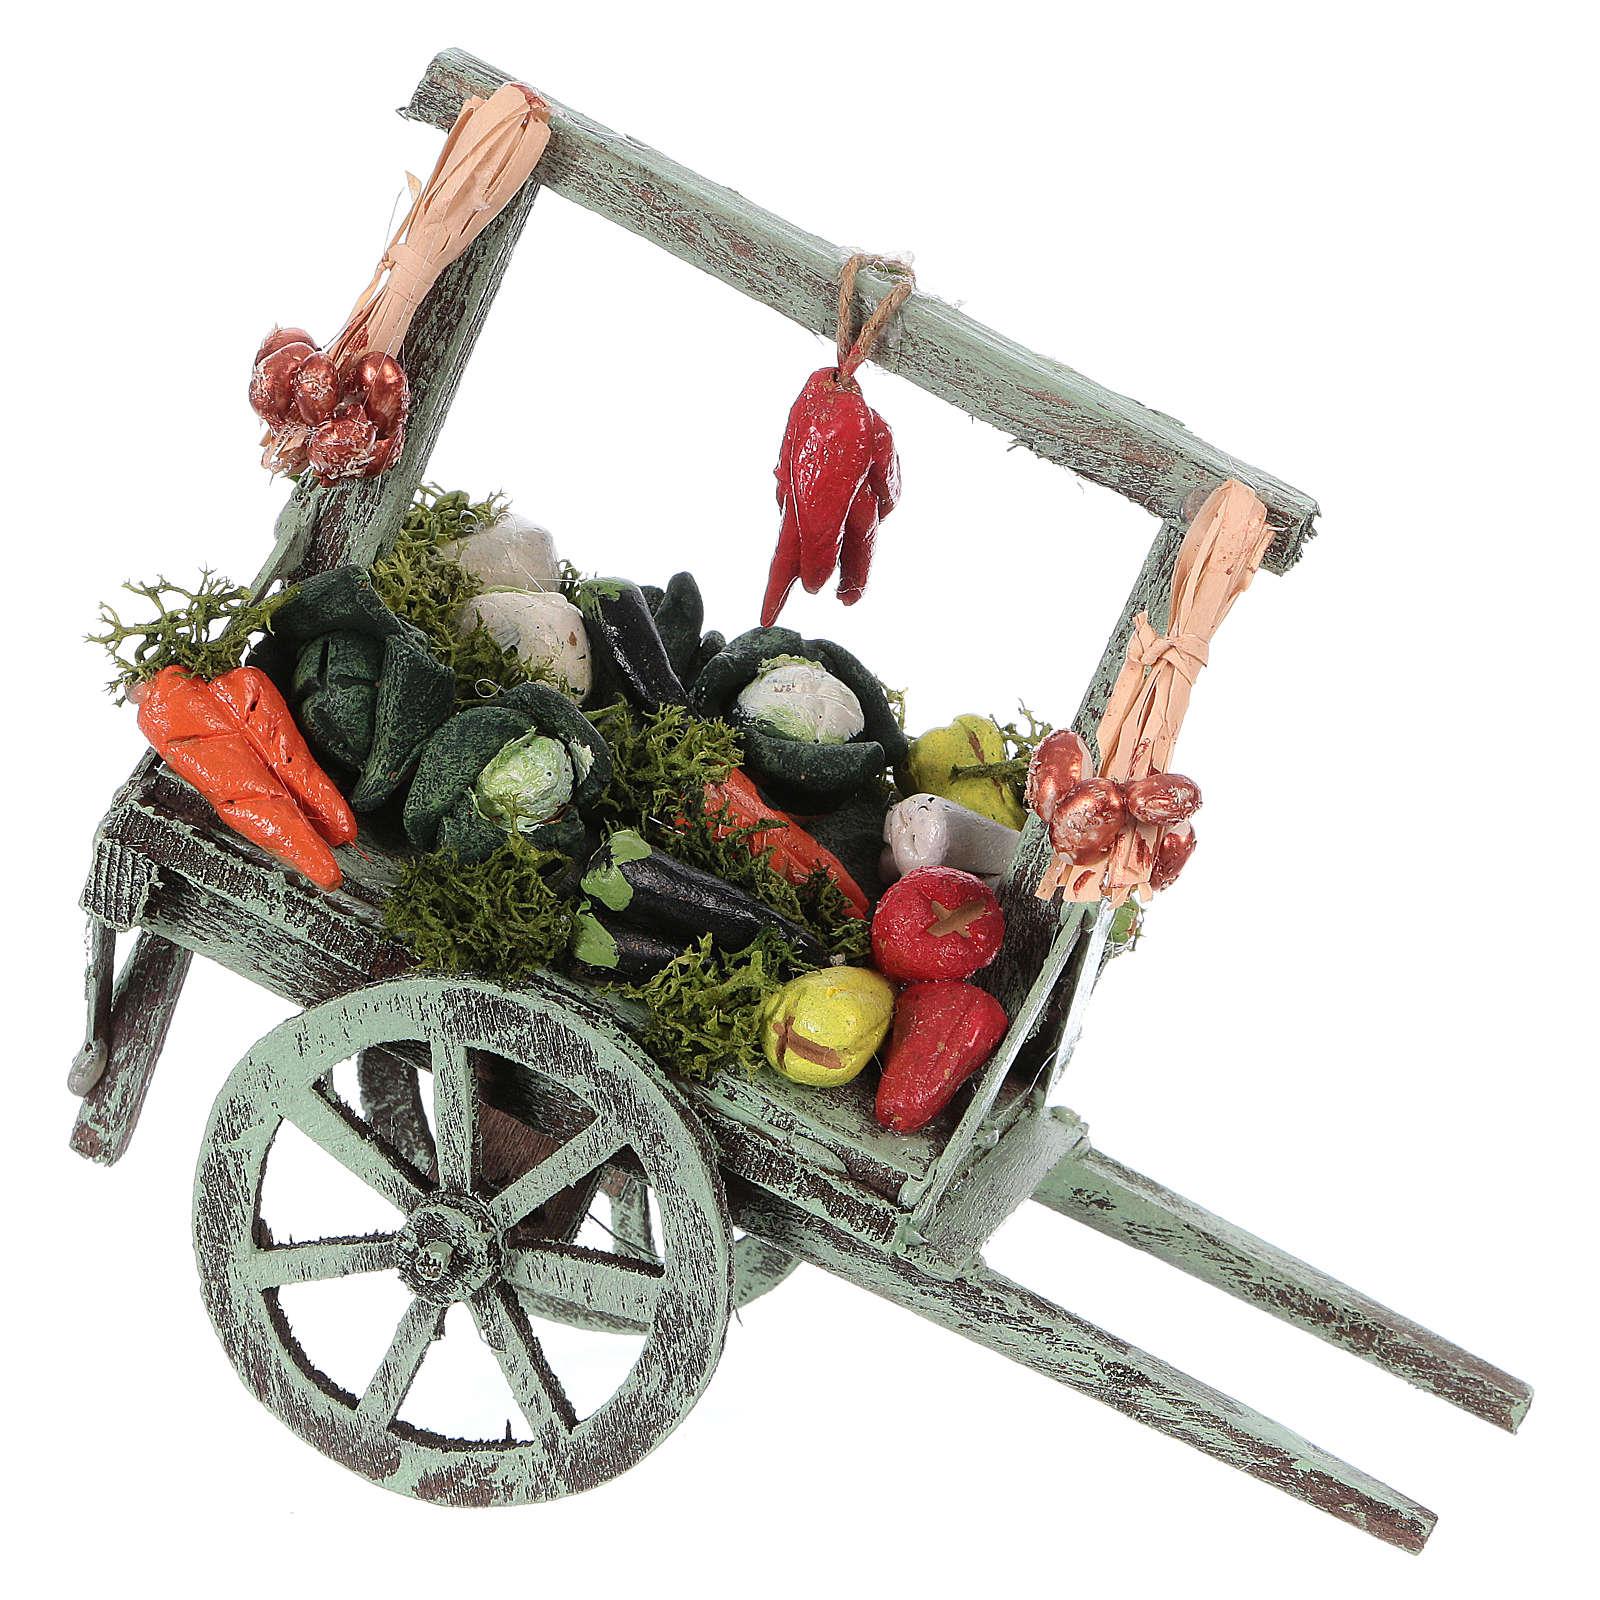 Cart with vegetables for Neapolitan Nativity Scene 15x15x6 cm 4